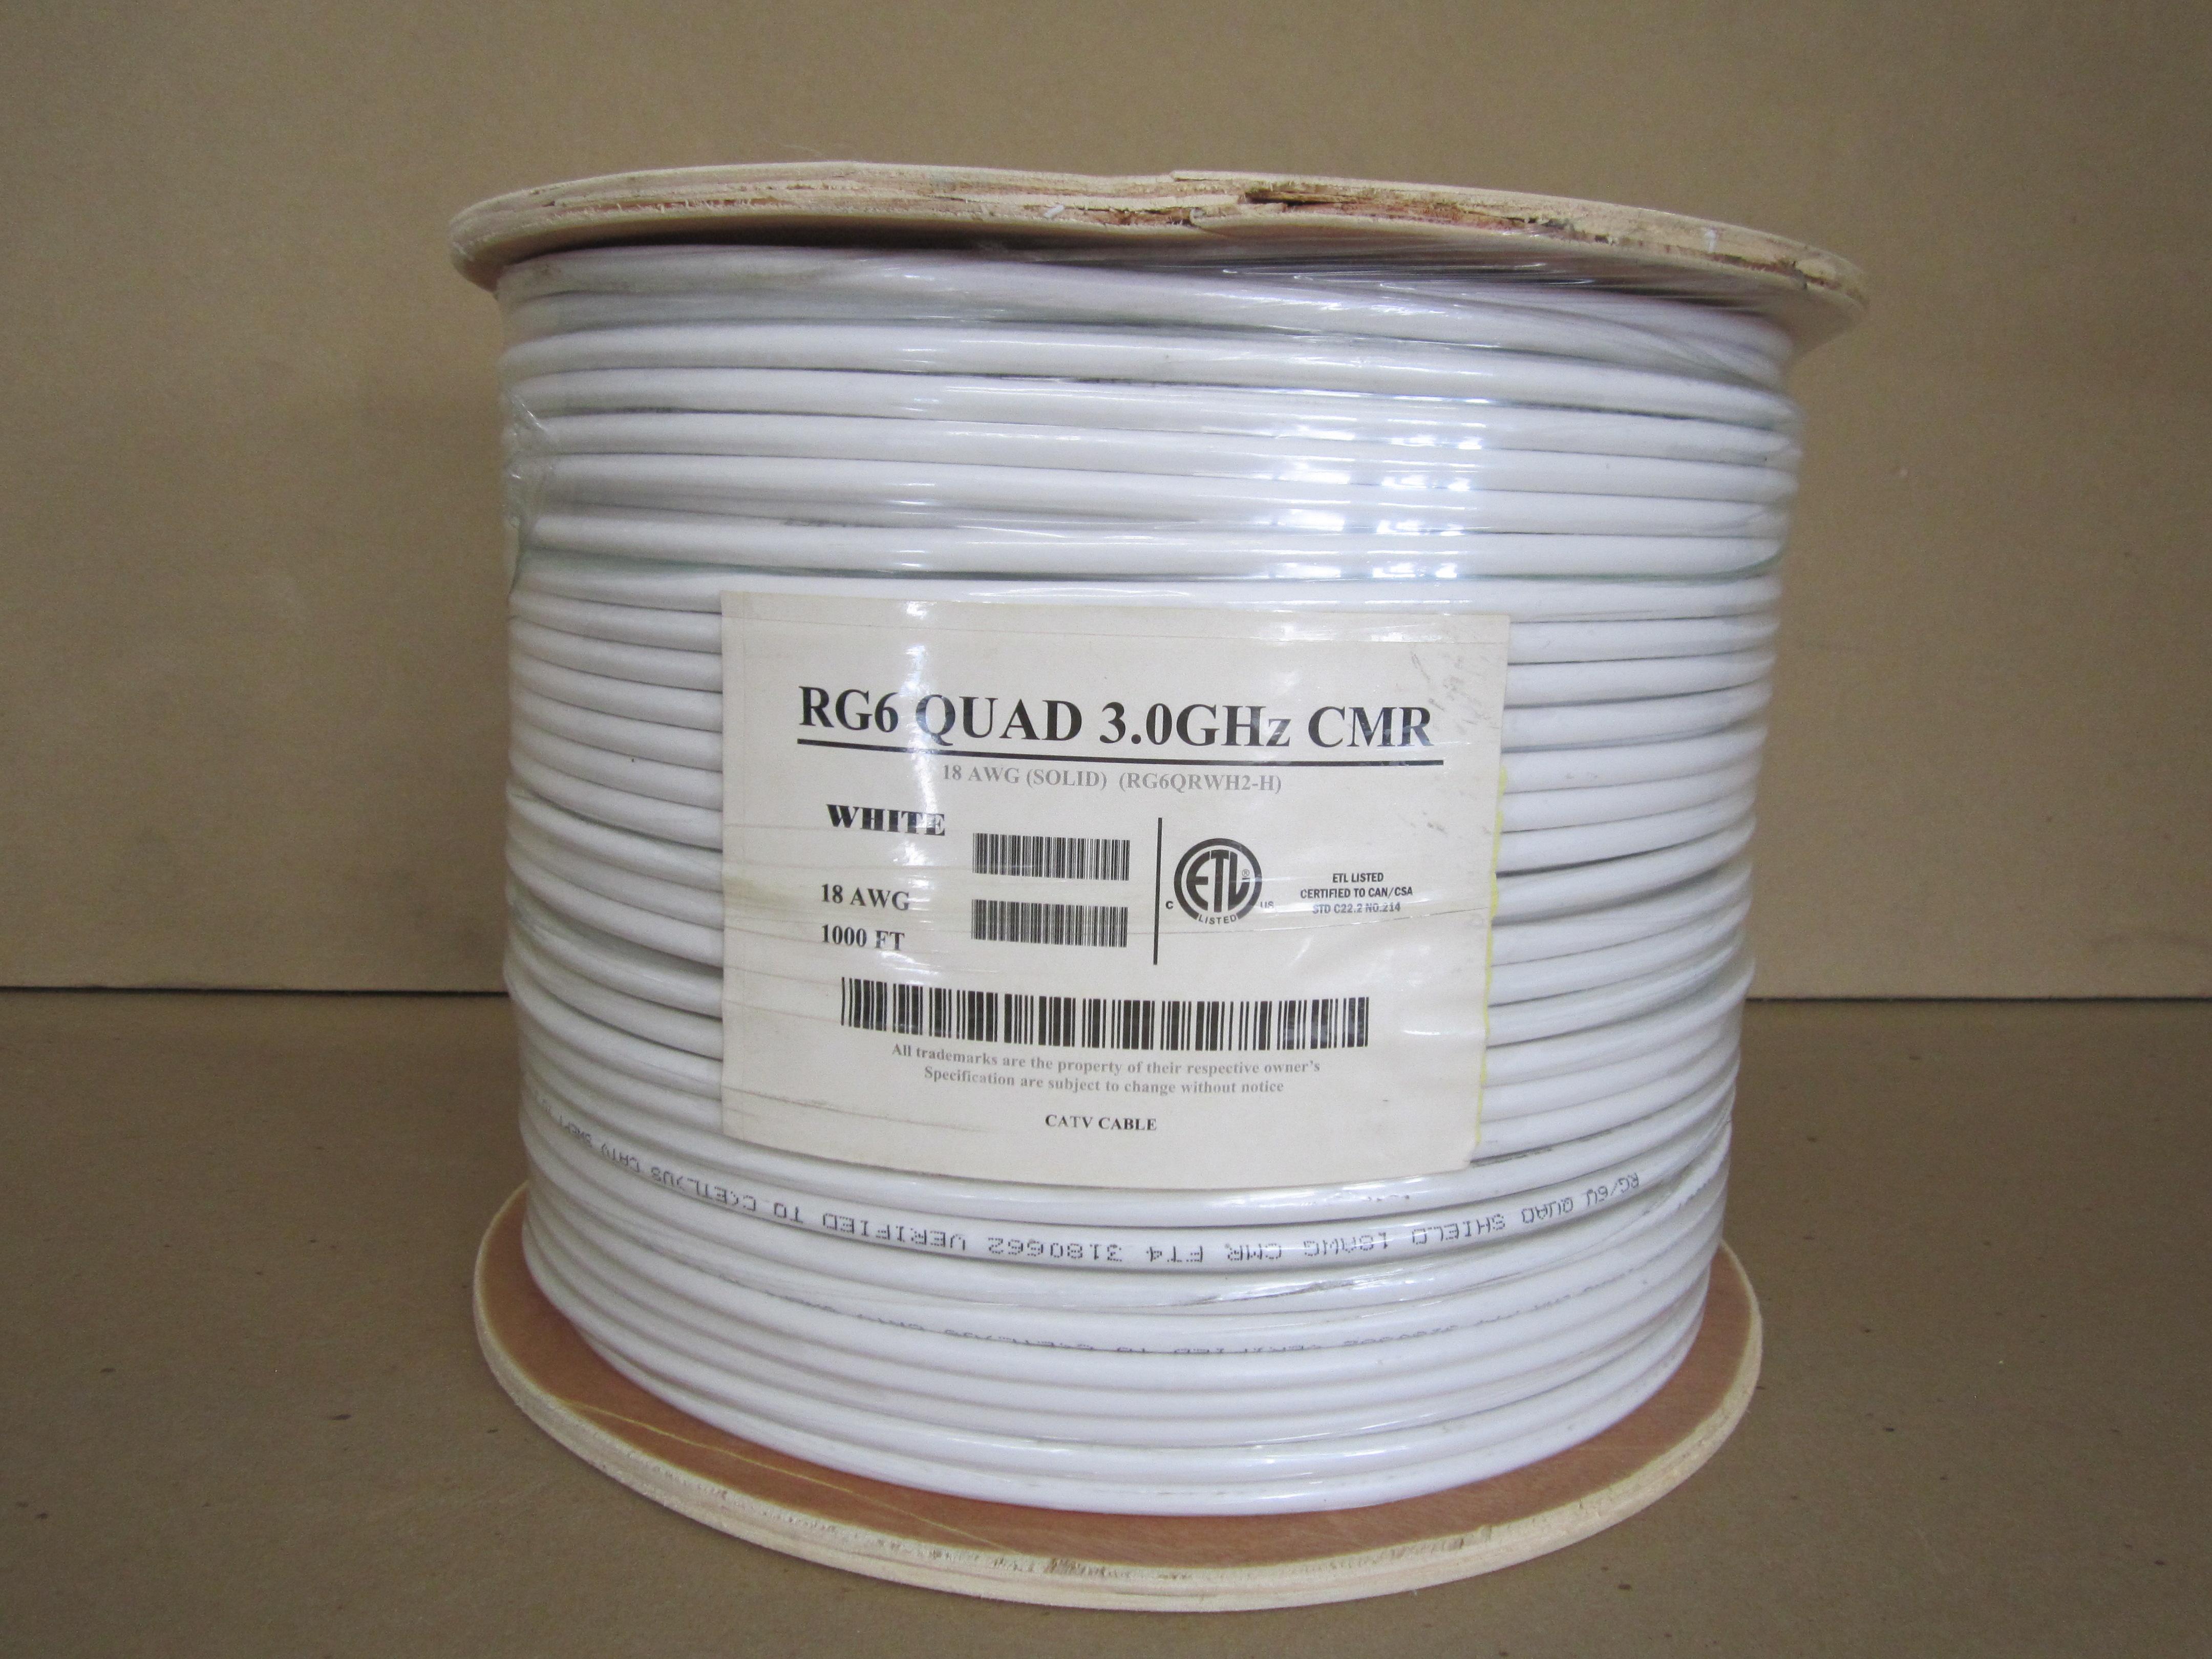 1000\' WHITE RG6 QUAD SHIELD CMR - 18AWG COAX CABLE